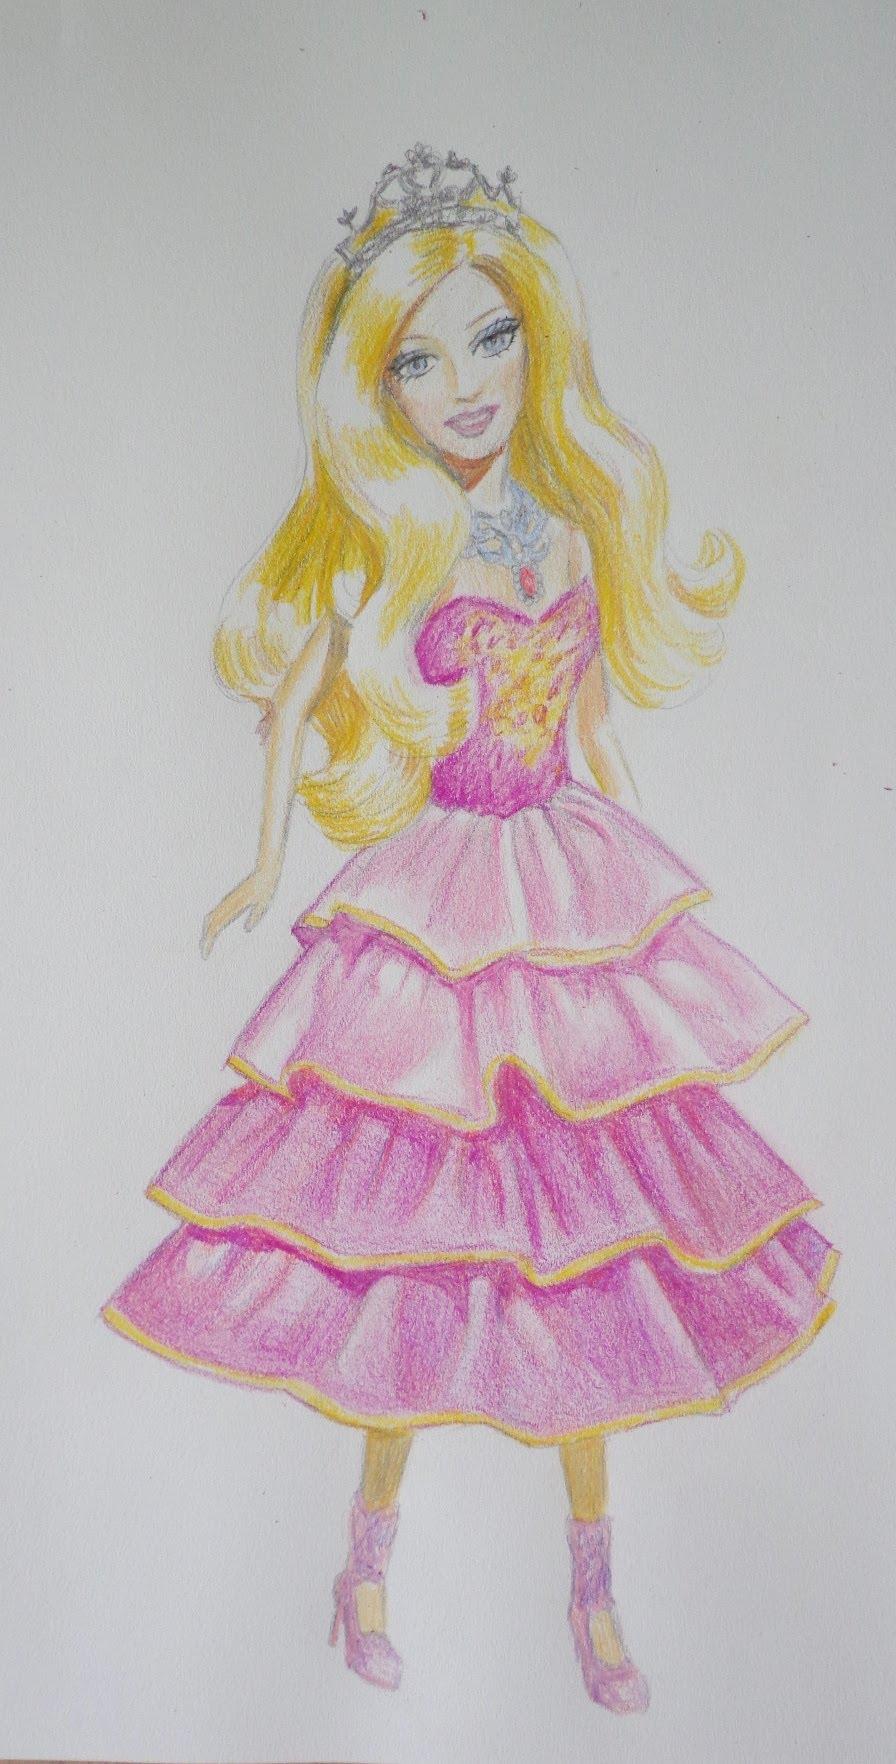 896x1764 How To Draw A Barbie Doll Step By Step